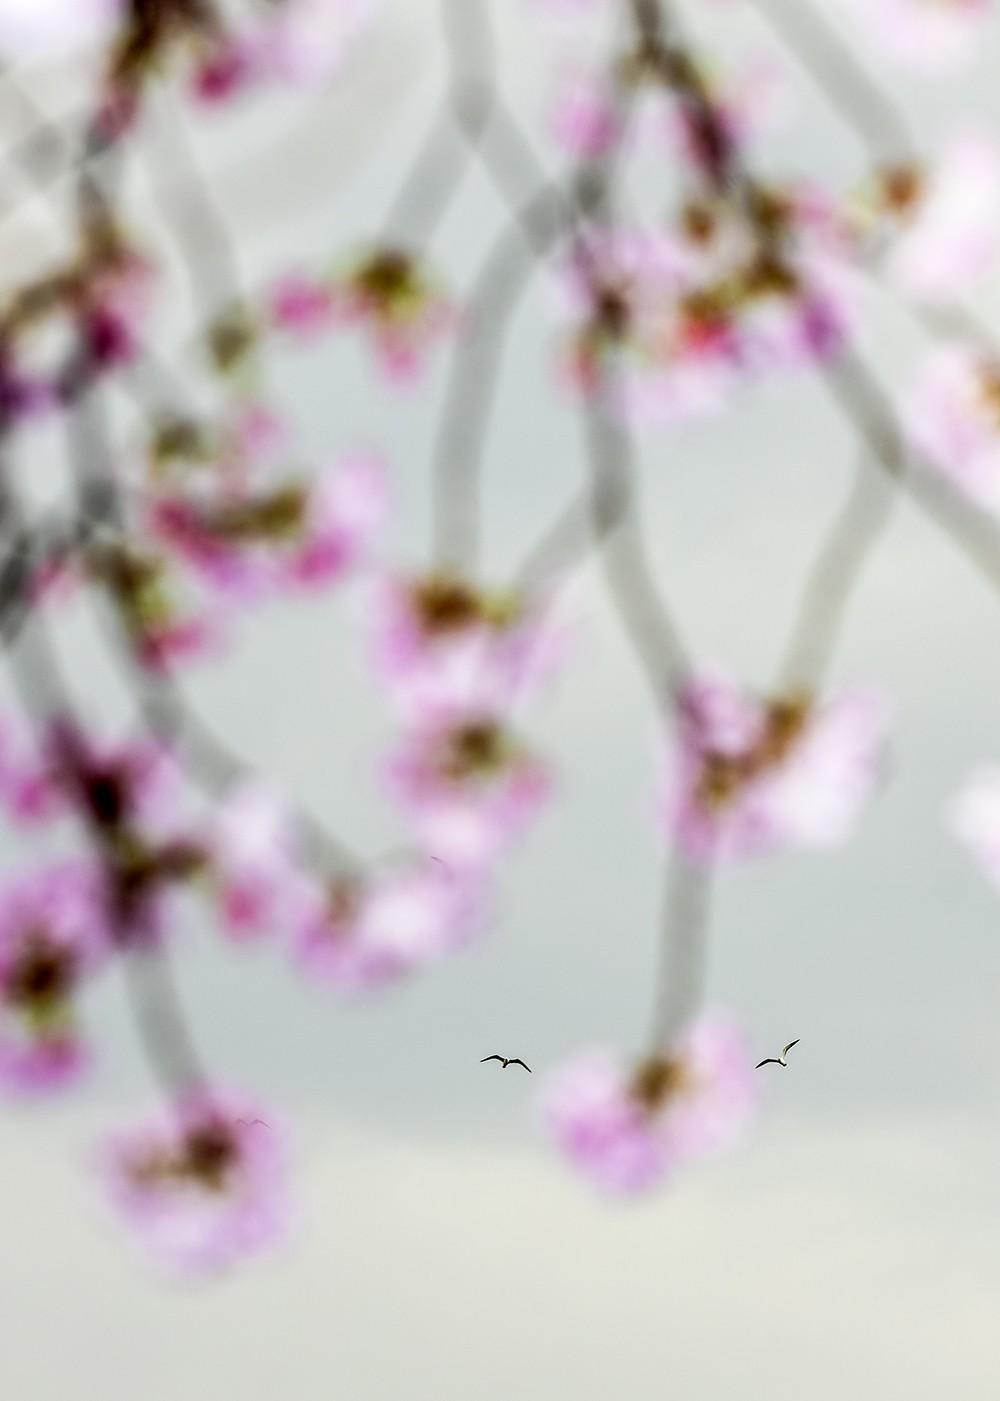 IBASHO_Gallery_yoshinori-mizutani-freebirds-ibashogallery